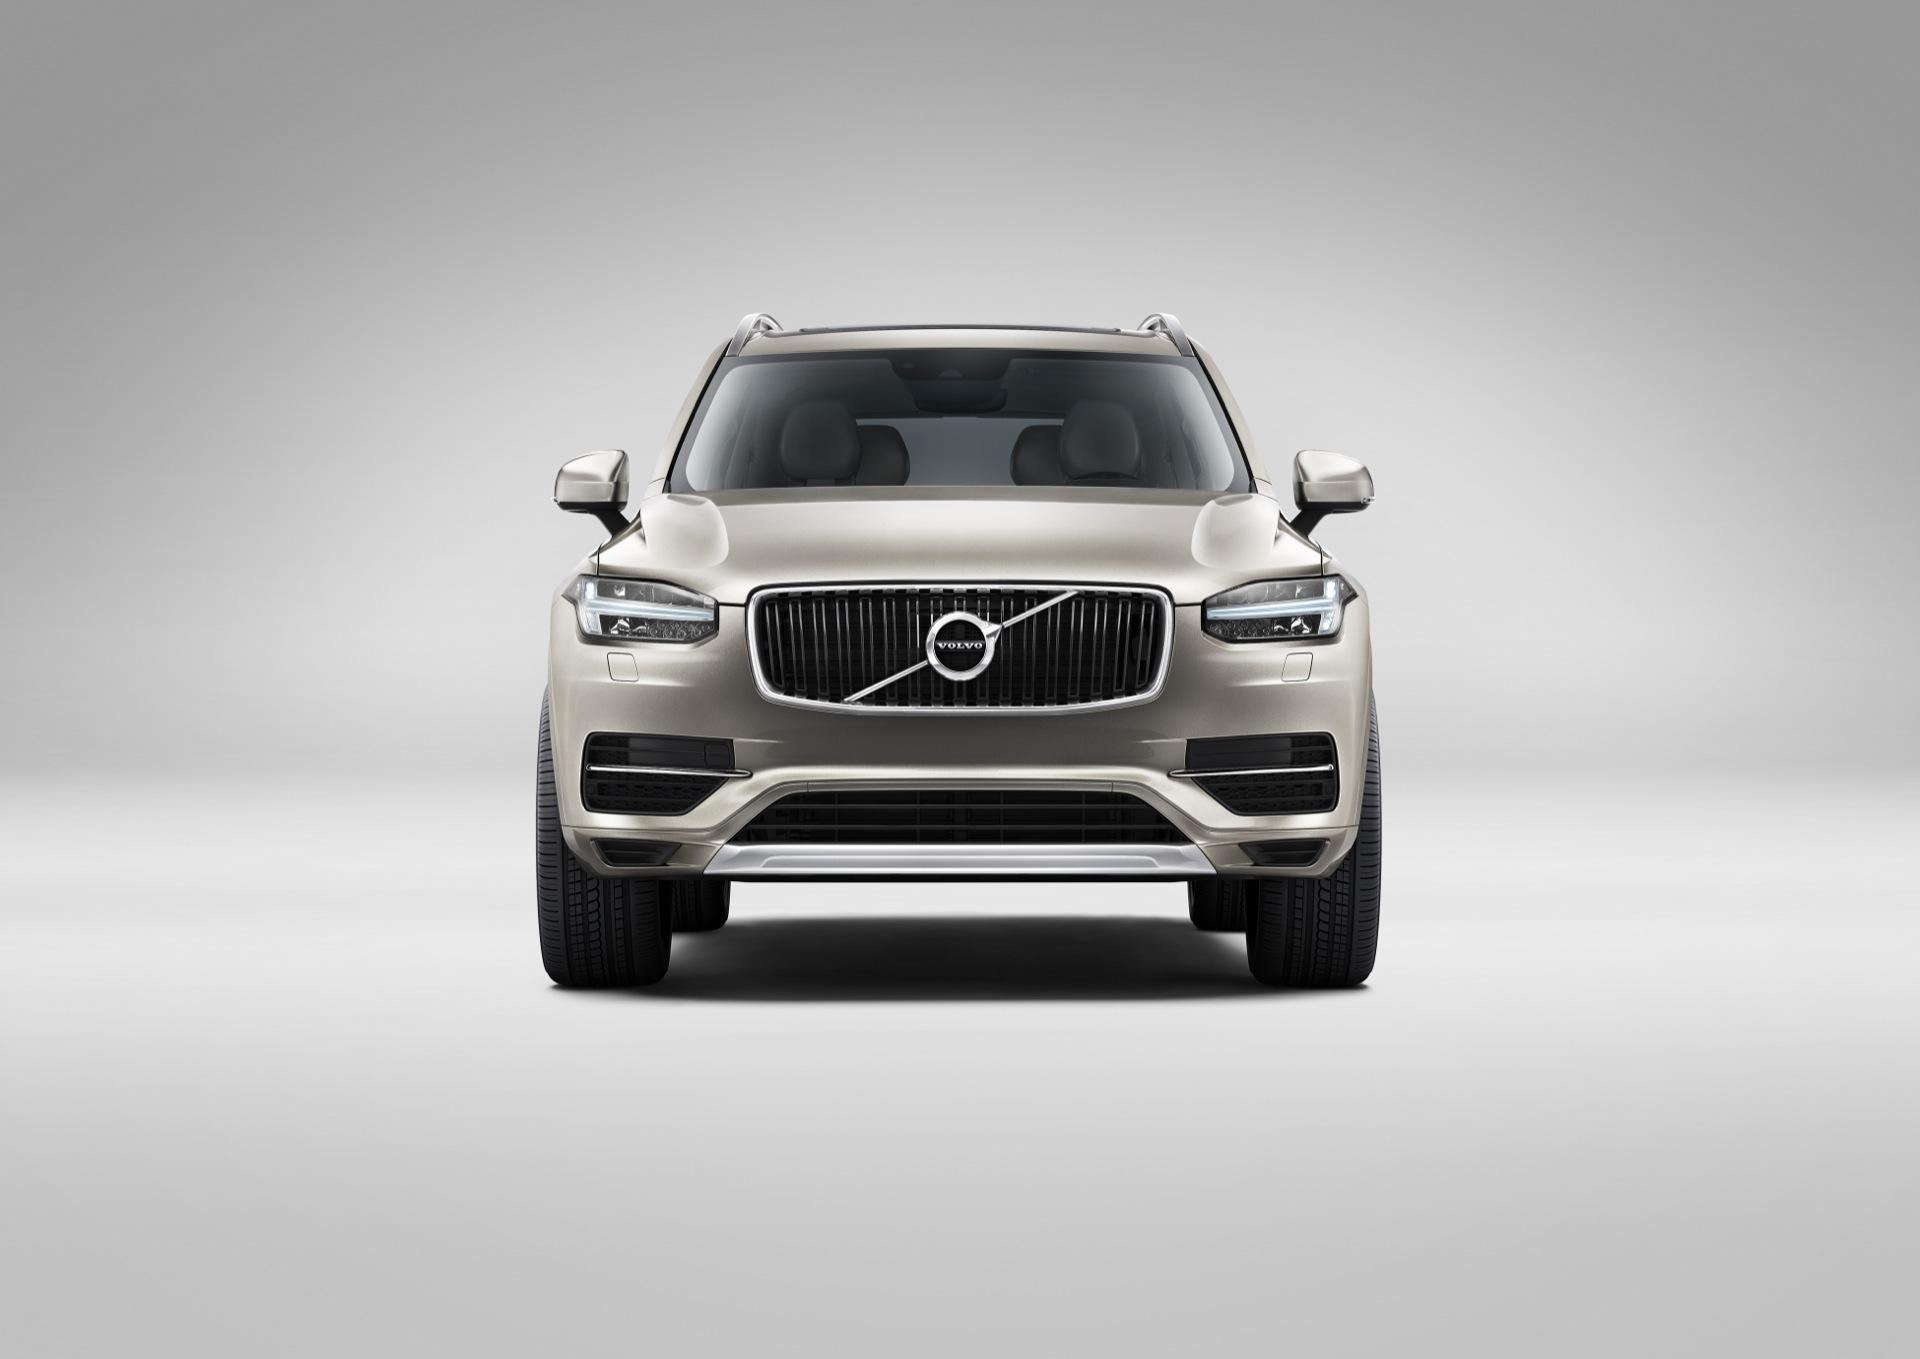 2016-2017 Volvo S60, S90, V60, XC60, XC90 recalled: 74,000 U.S. vehicles affected